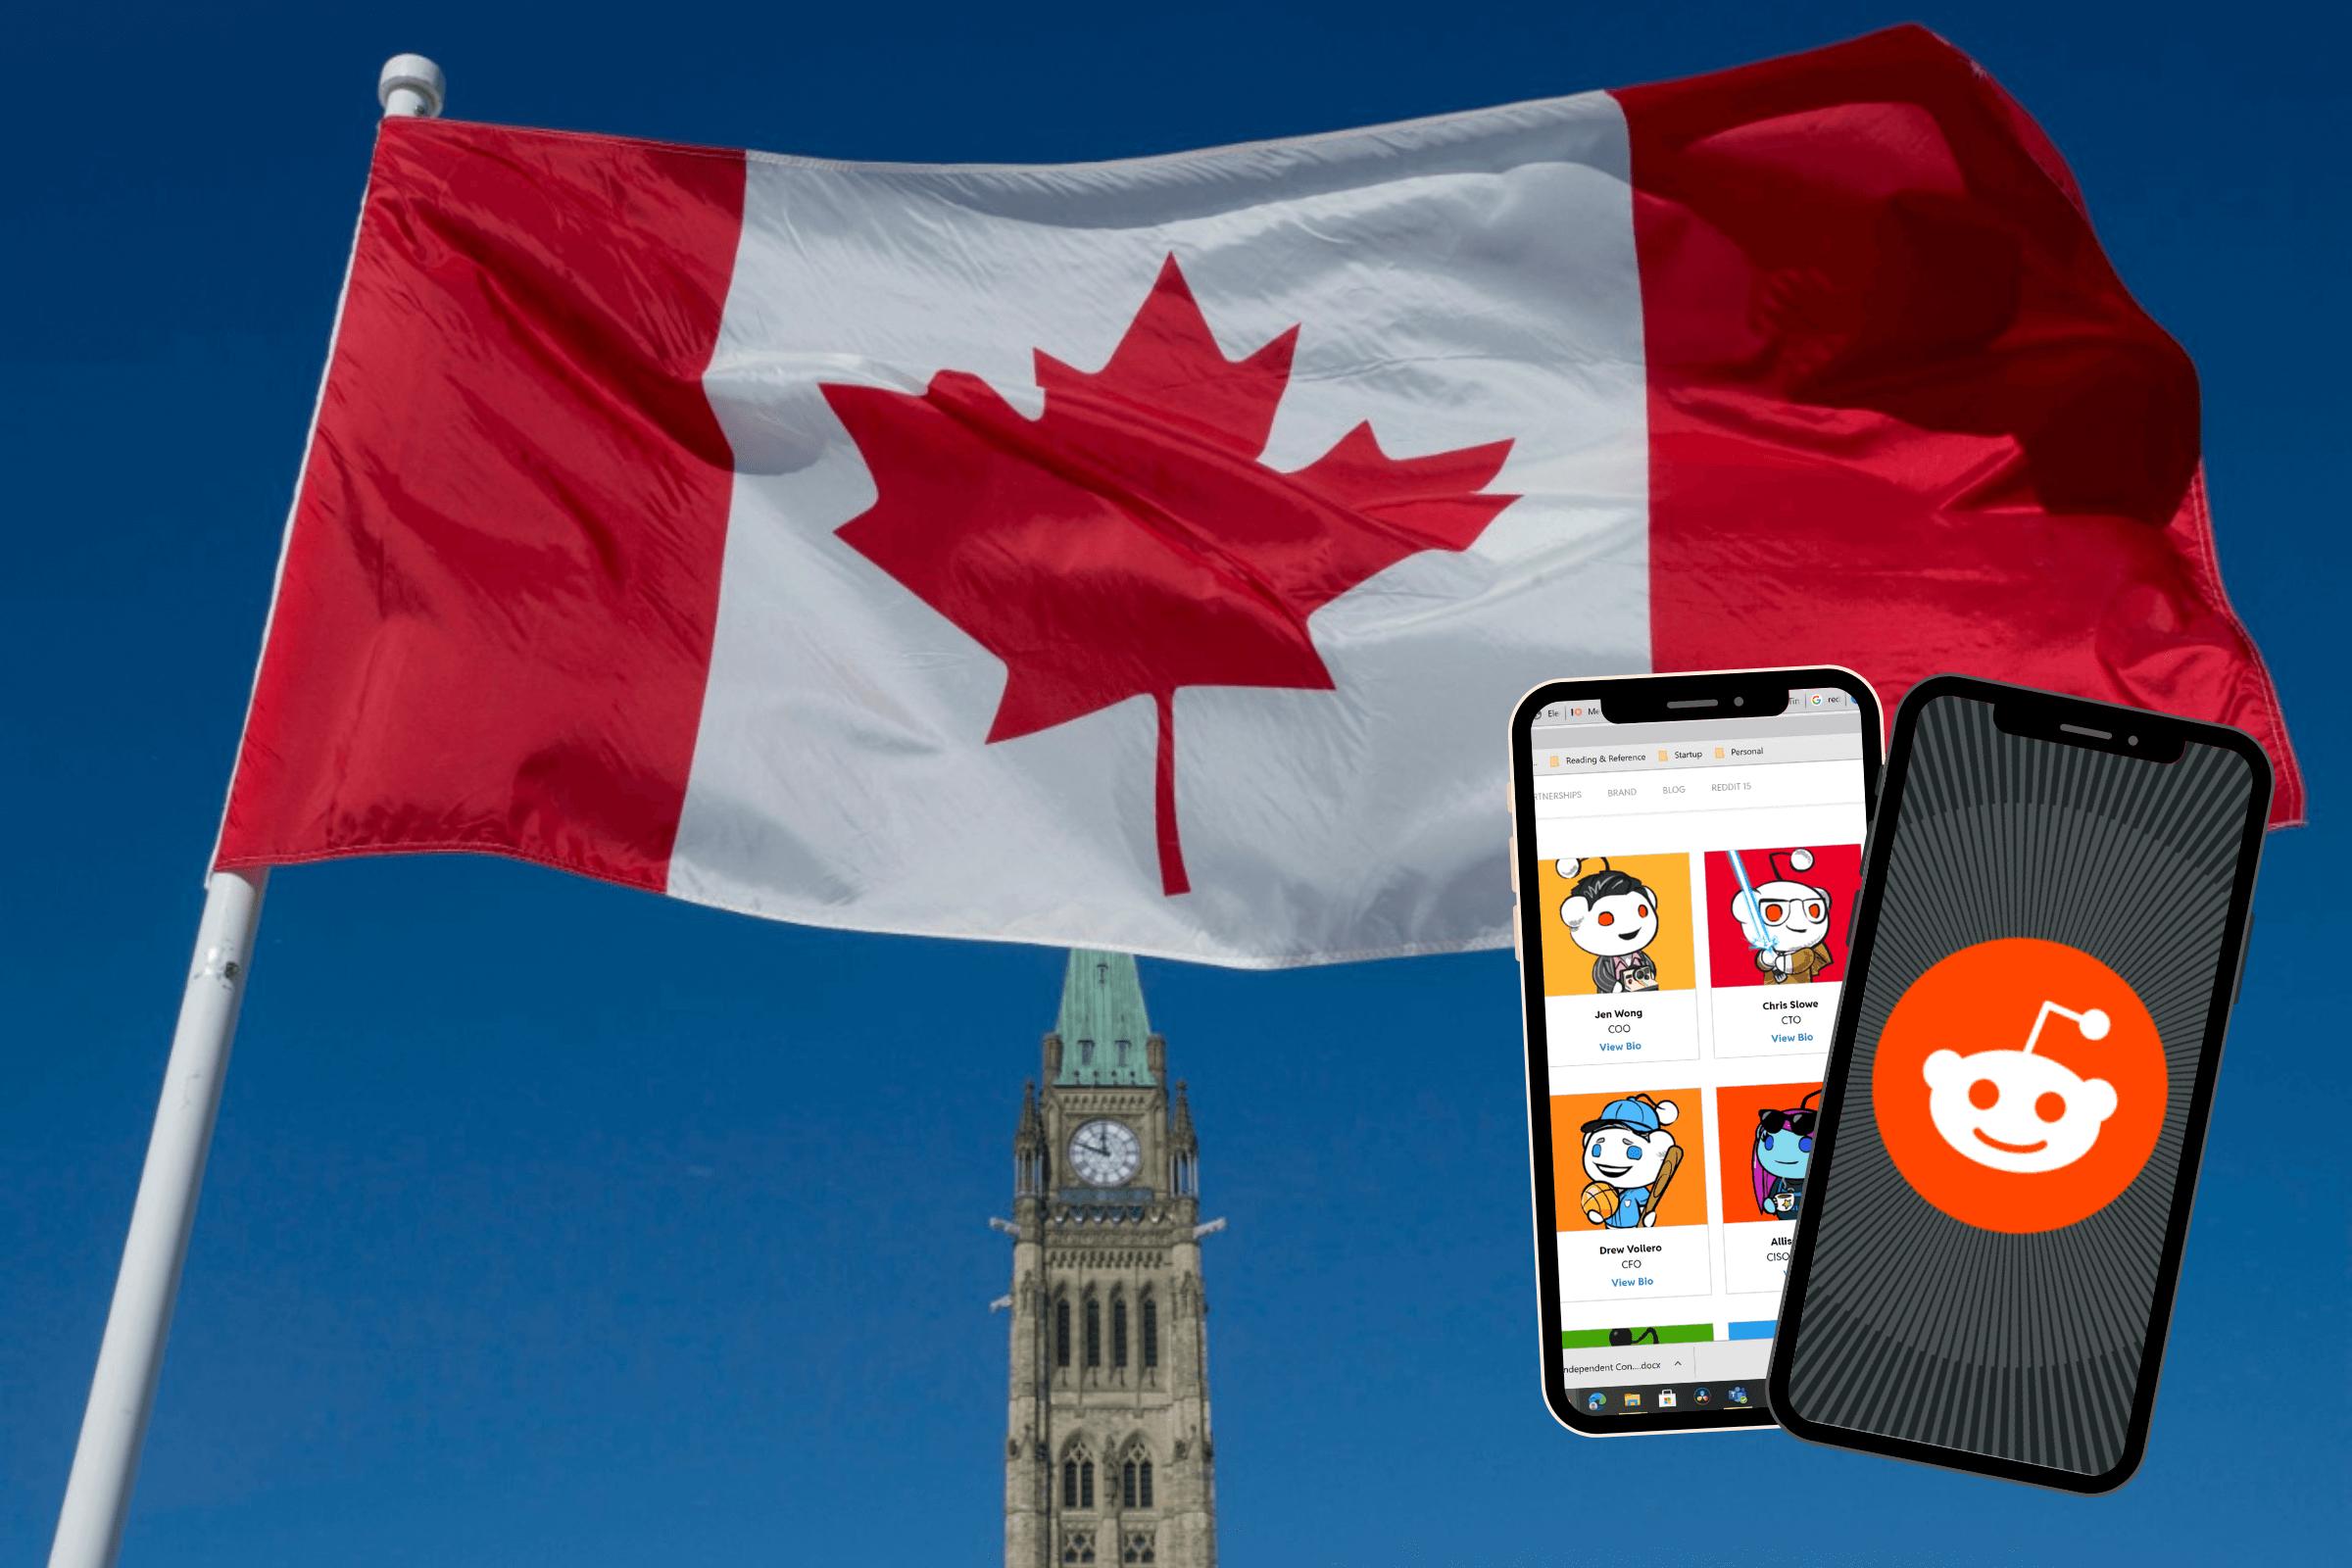 Reddit to set up in Canada increasing global presence